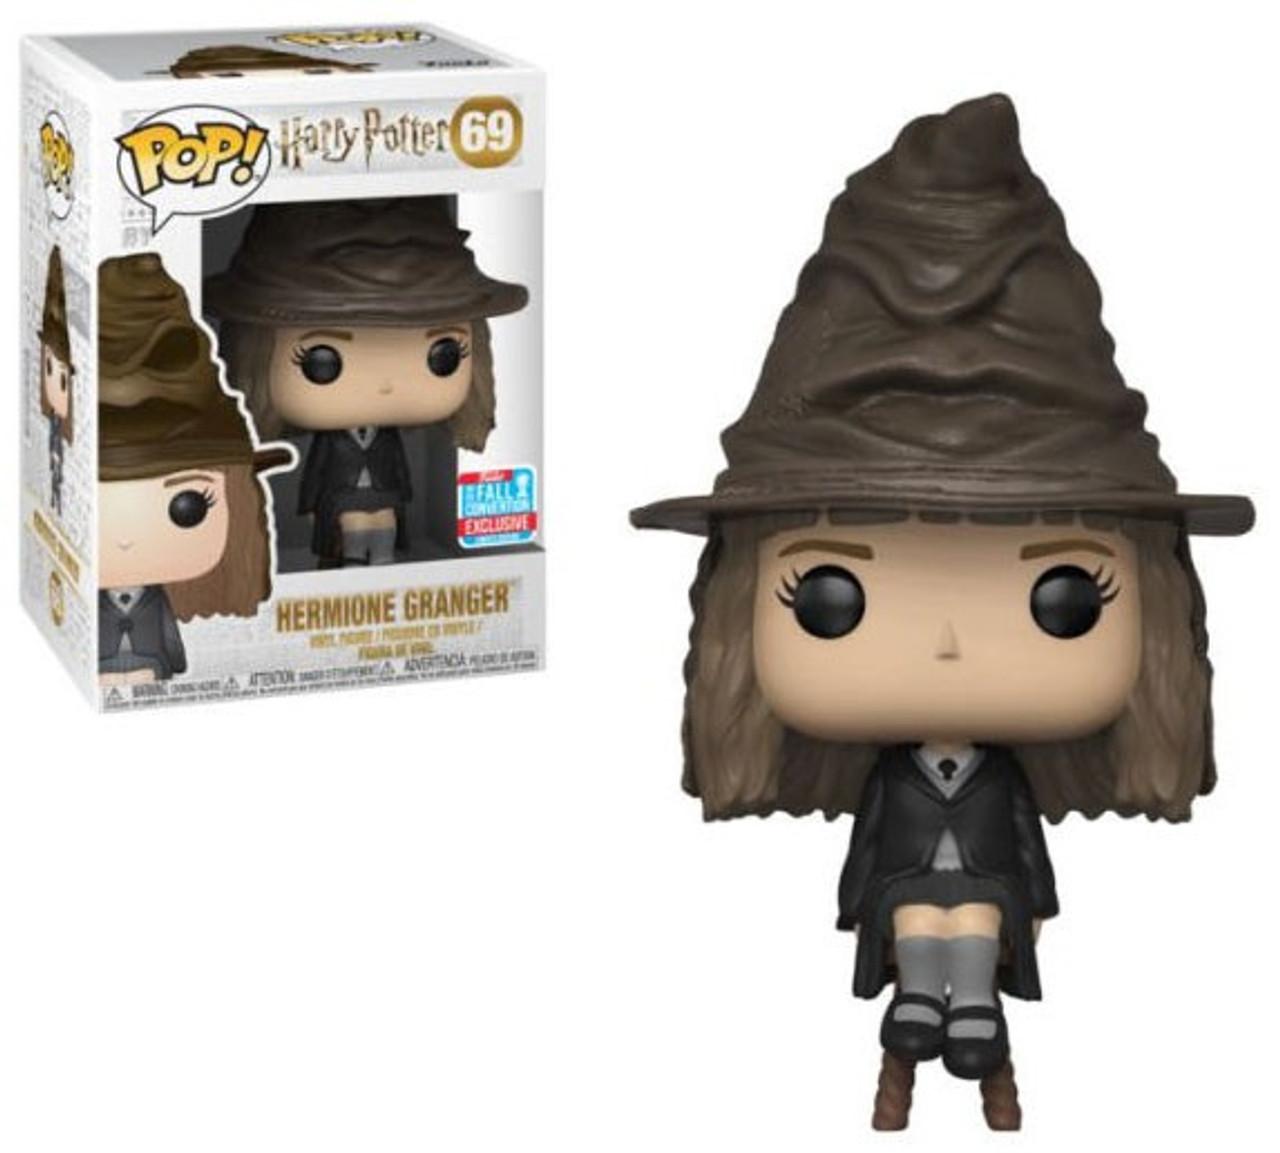 8d62cde2d06 Funko Harry Potter Funko POP Movies Hermione Granger Exclusive Vinyl Figure  69 Sorting Hat - ToyWiz